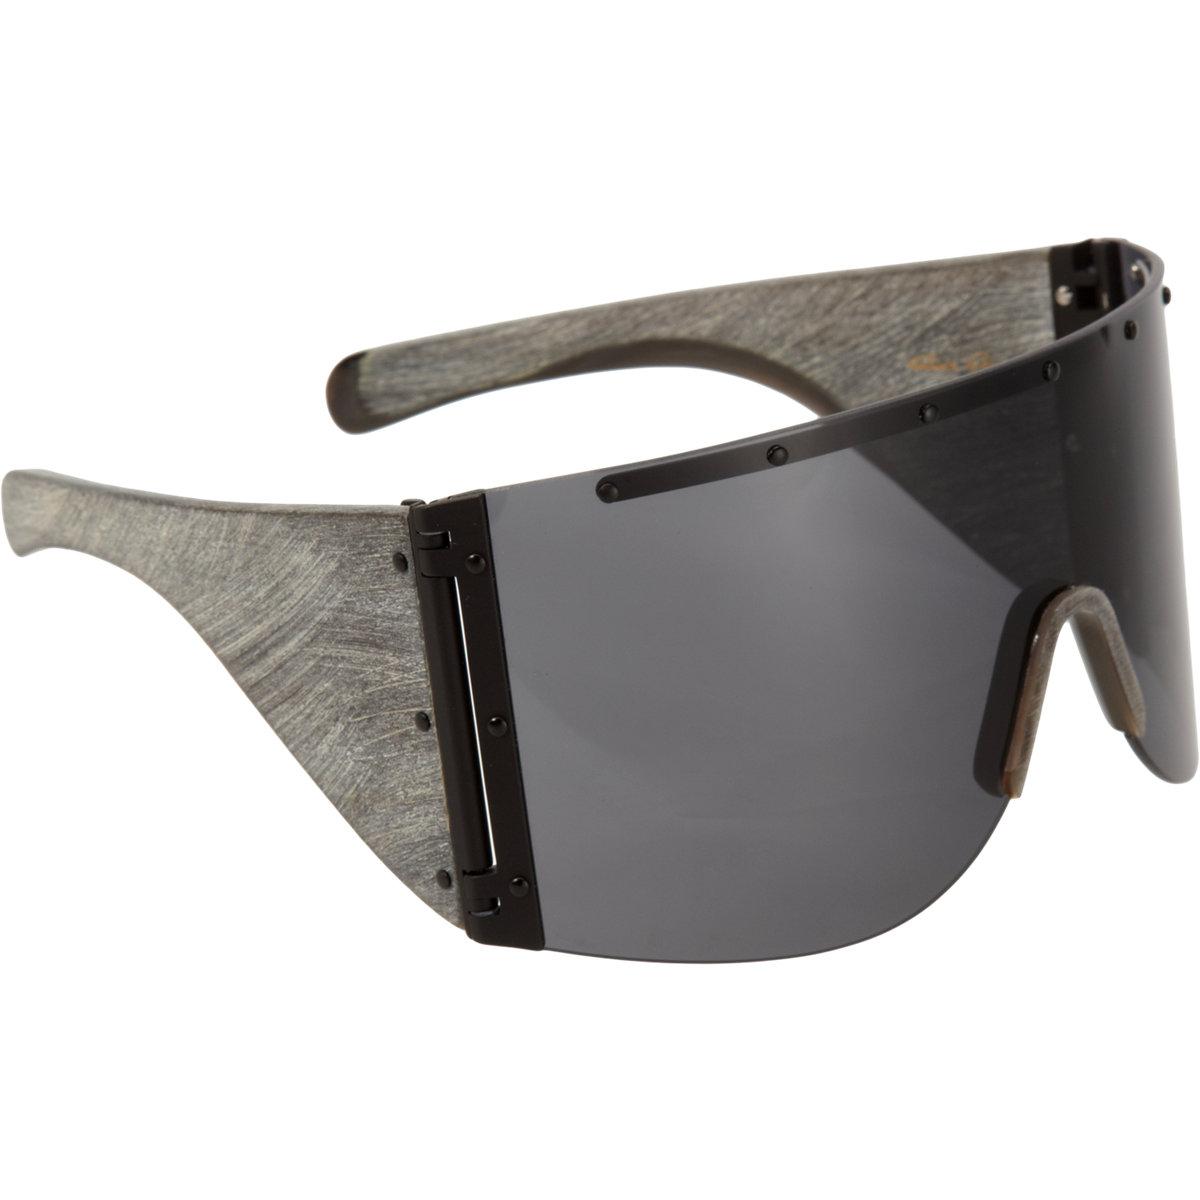 1d3b0374549 Lyst - Rick Owens Oversized Shield Sunglasses in Black for Men